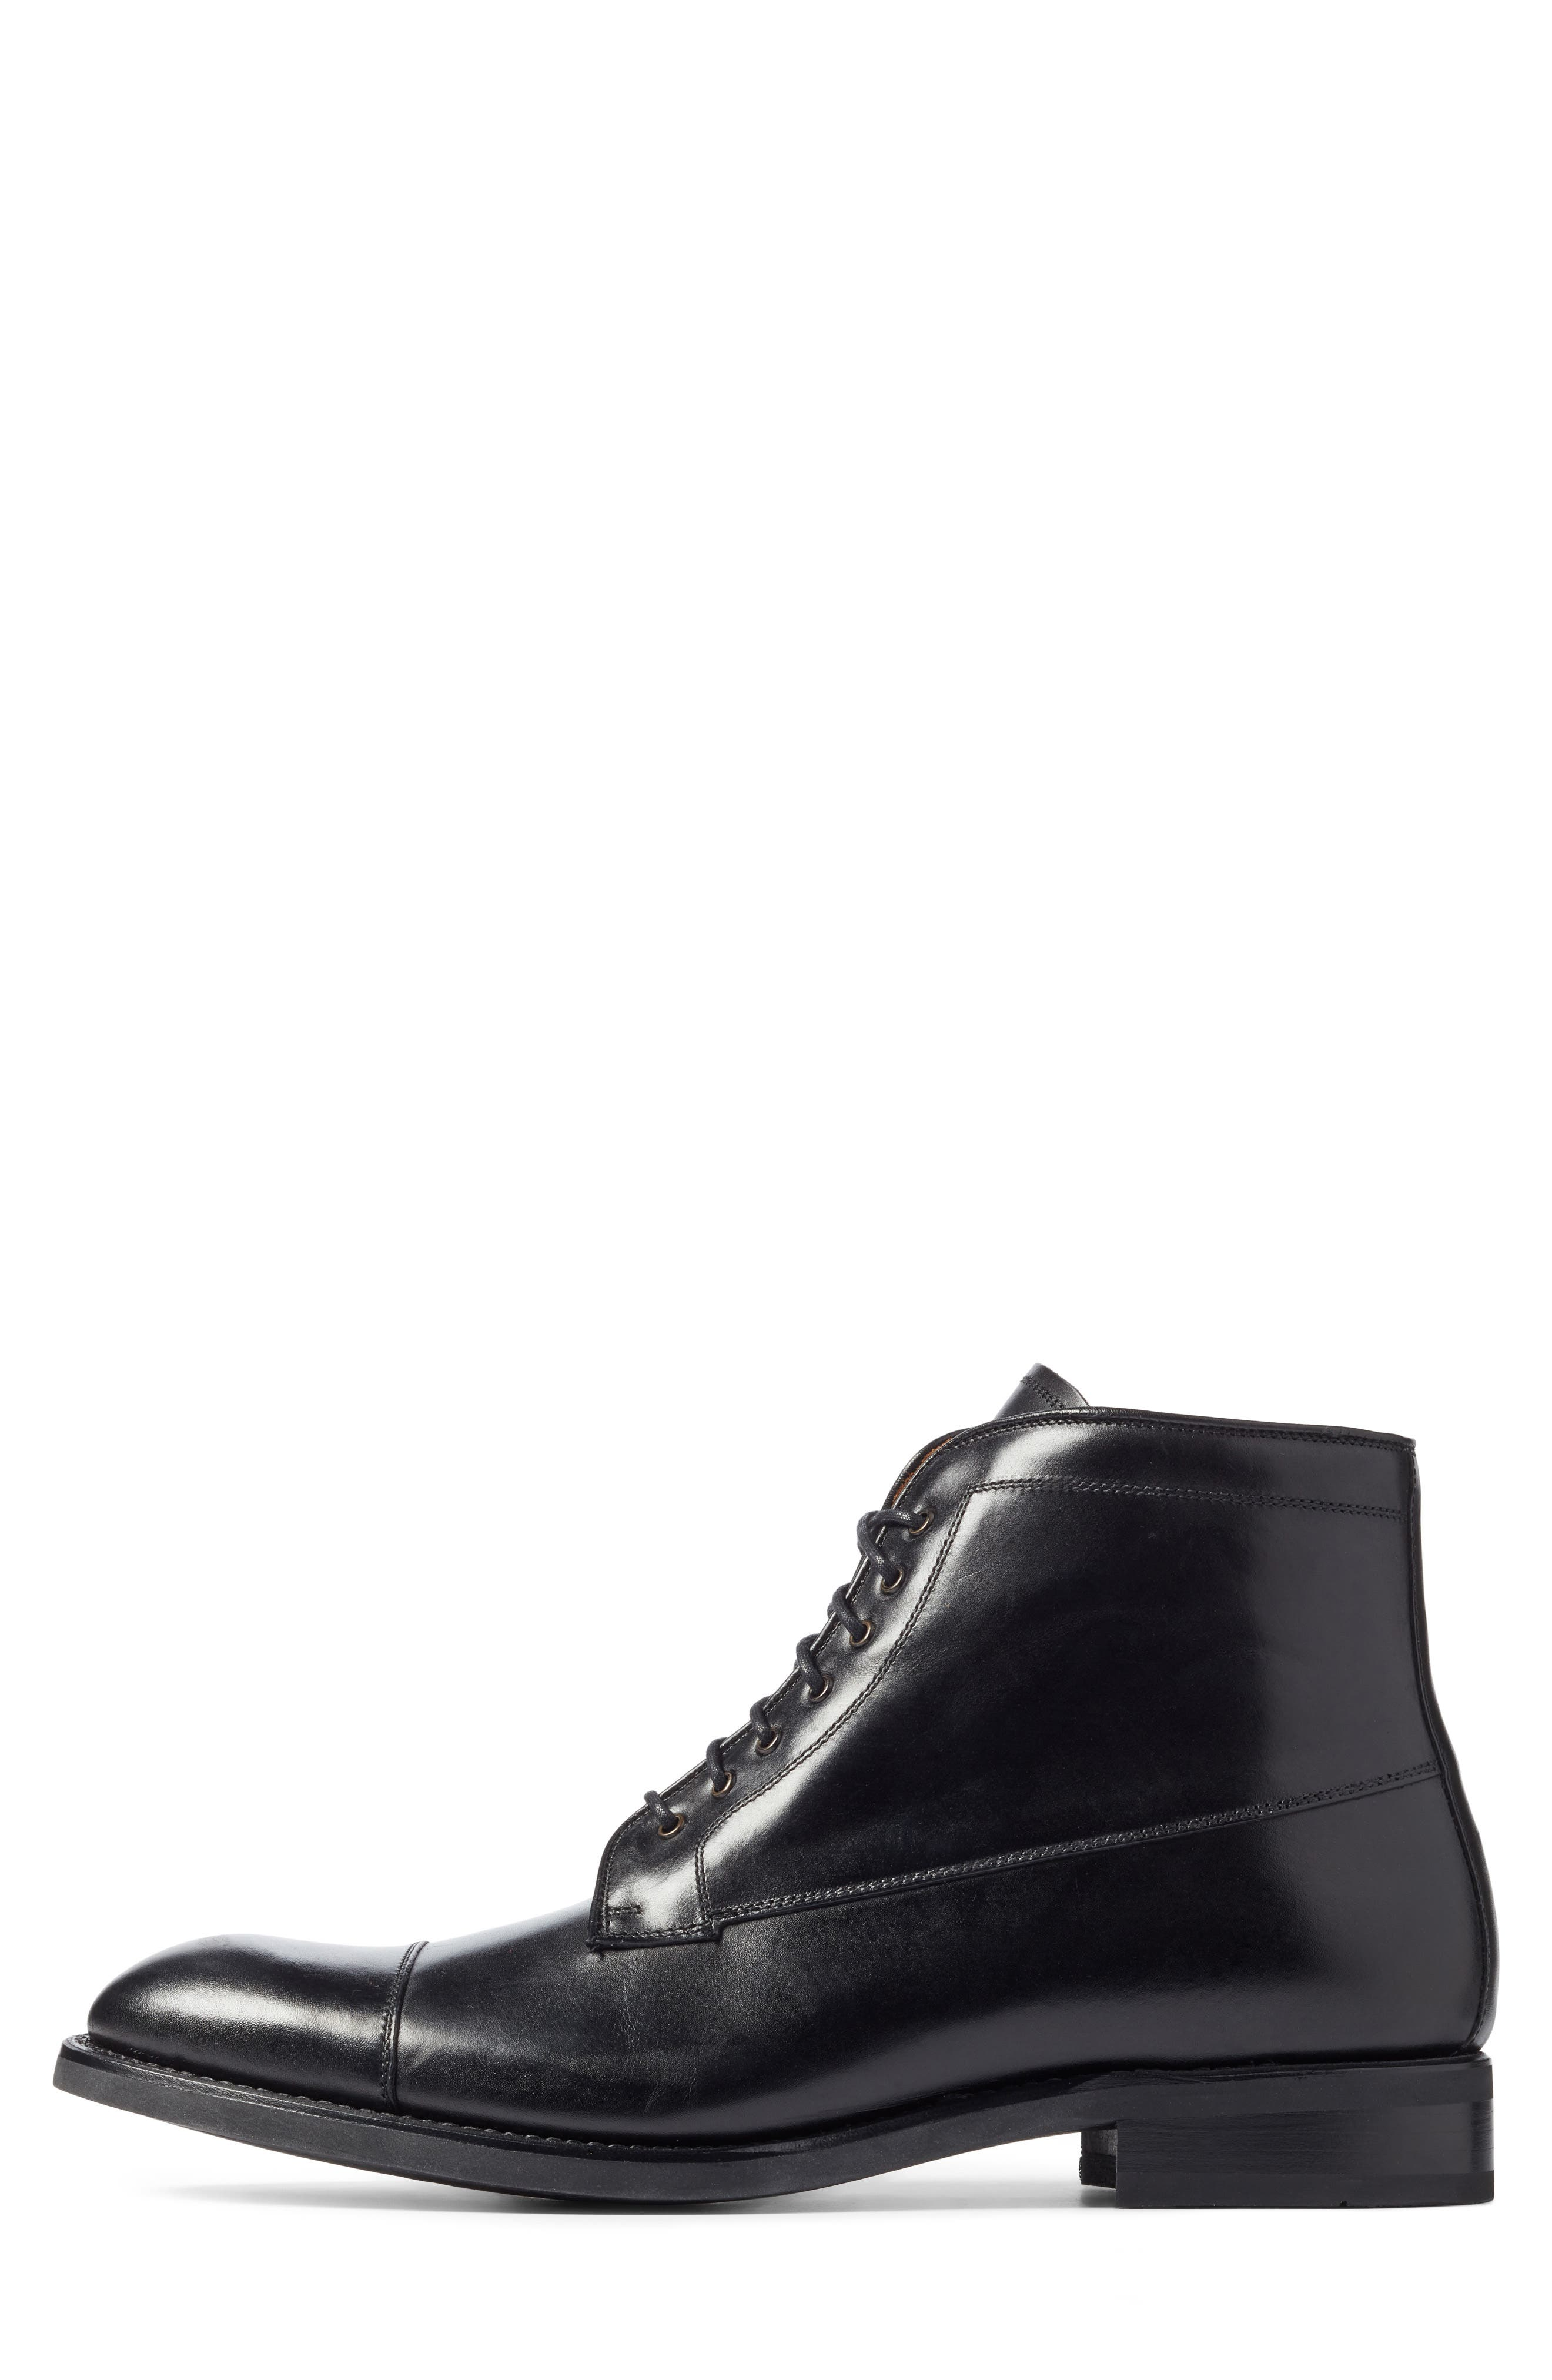 Chester Cap Toe Boot,                             Alternate thumbnail 3, color,                             Black Leather